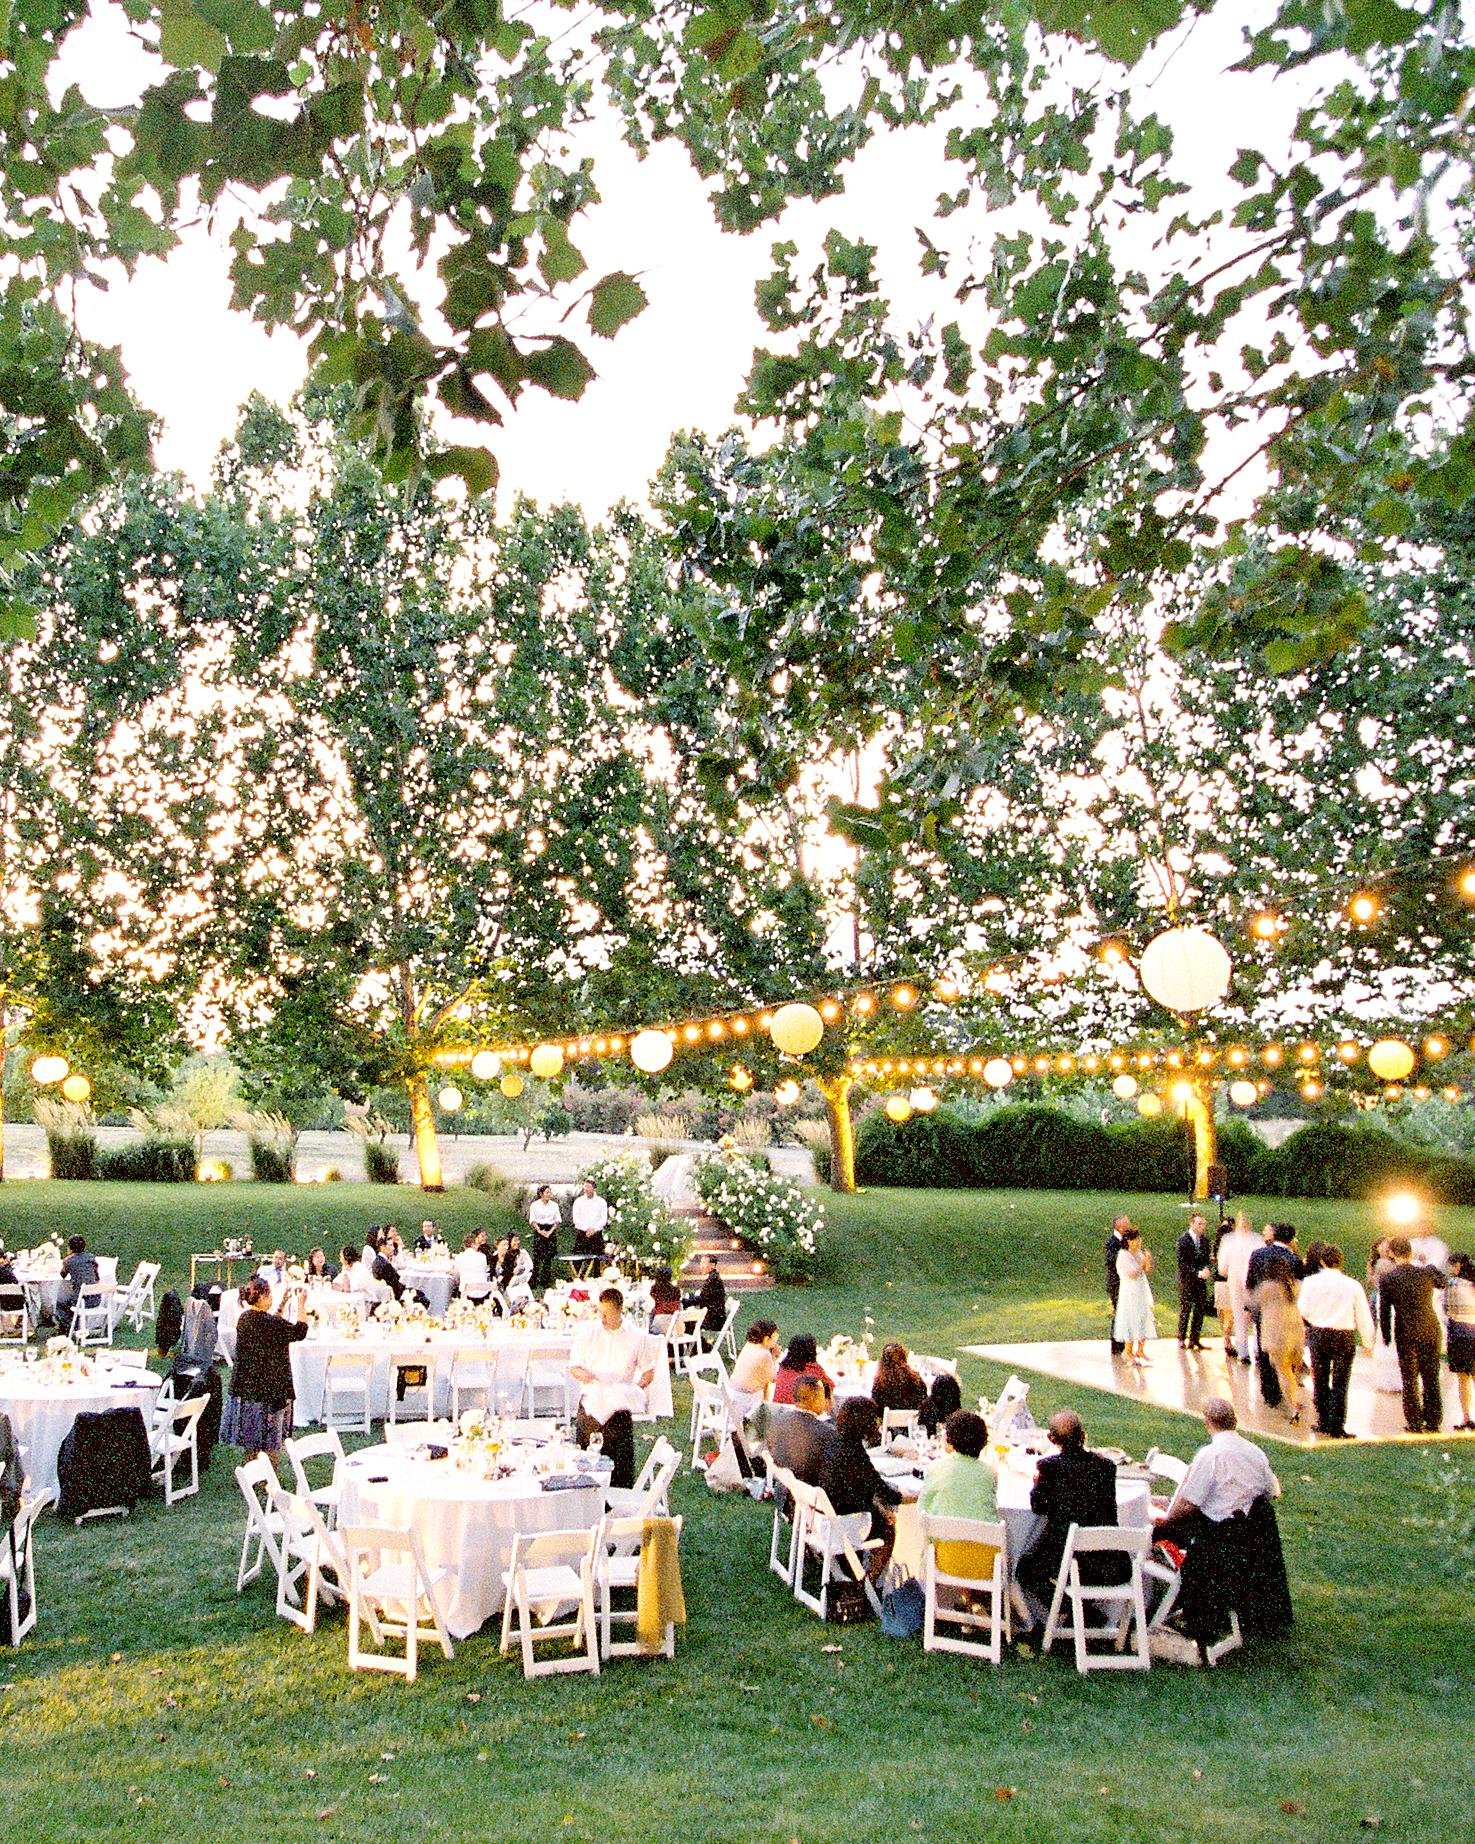 real-weddings-zoe-john-006740-R1-073-35.jpg